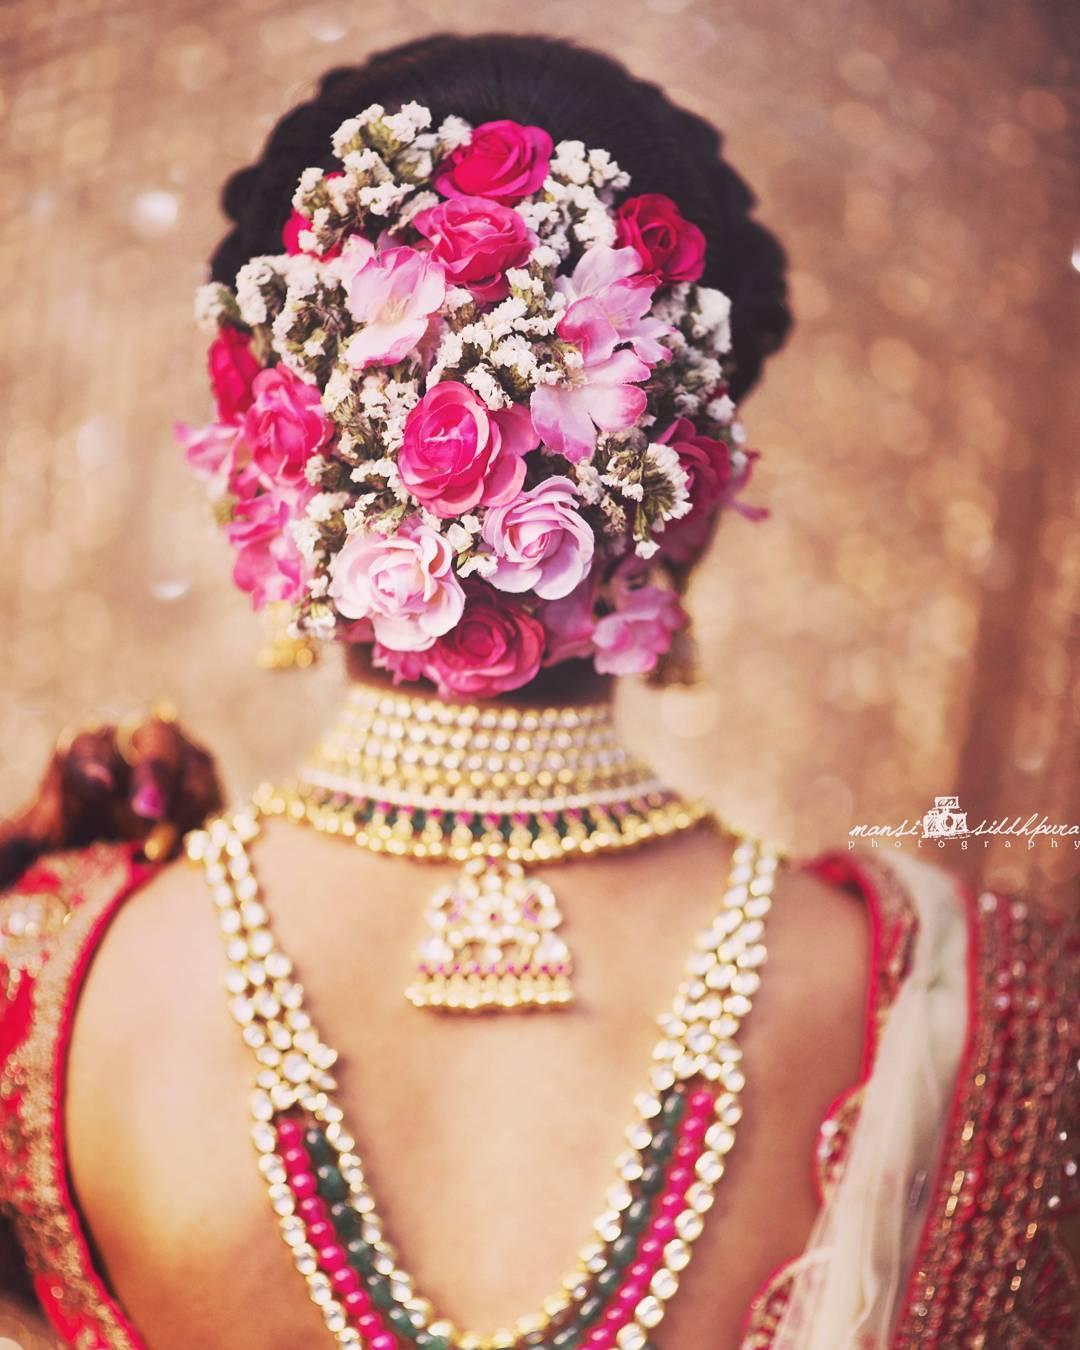 Bridal Makeup, Bridal Makeup Trends, Makeup, Makeup Trends, Makeup Trends 2018, Bridal Hair, Bridal Hairdo, Bridal Hairstyle, Bridal Hair Trends